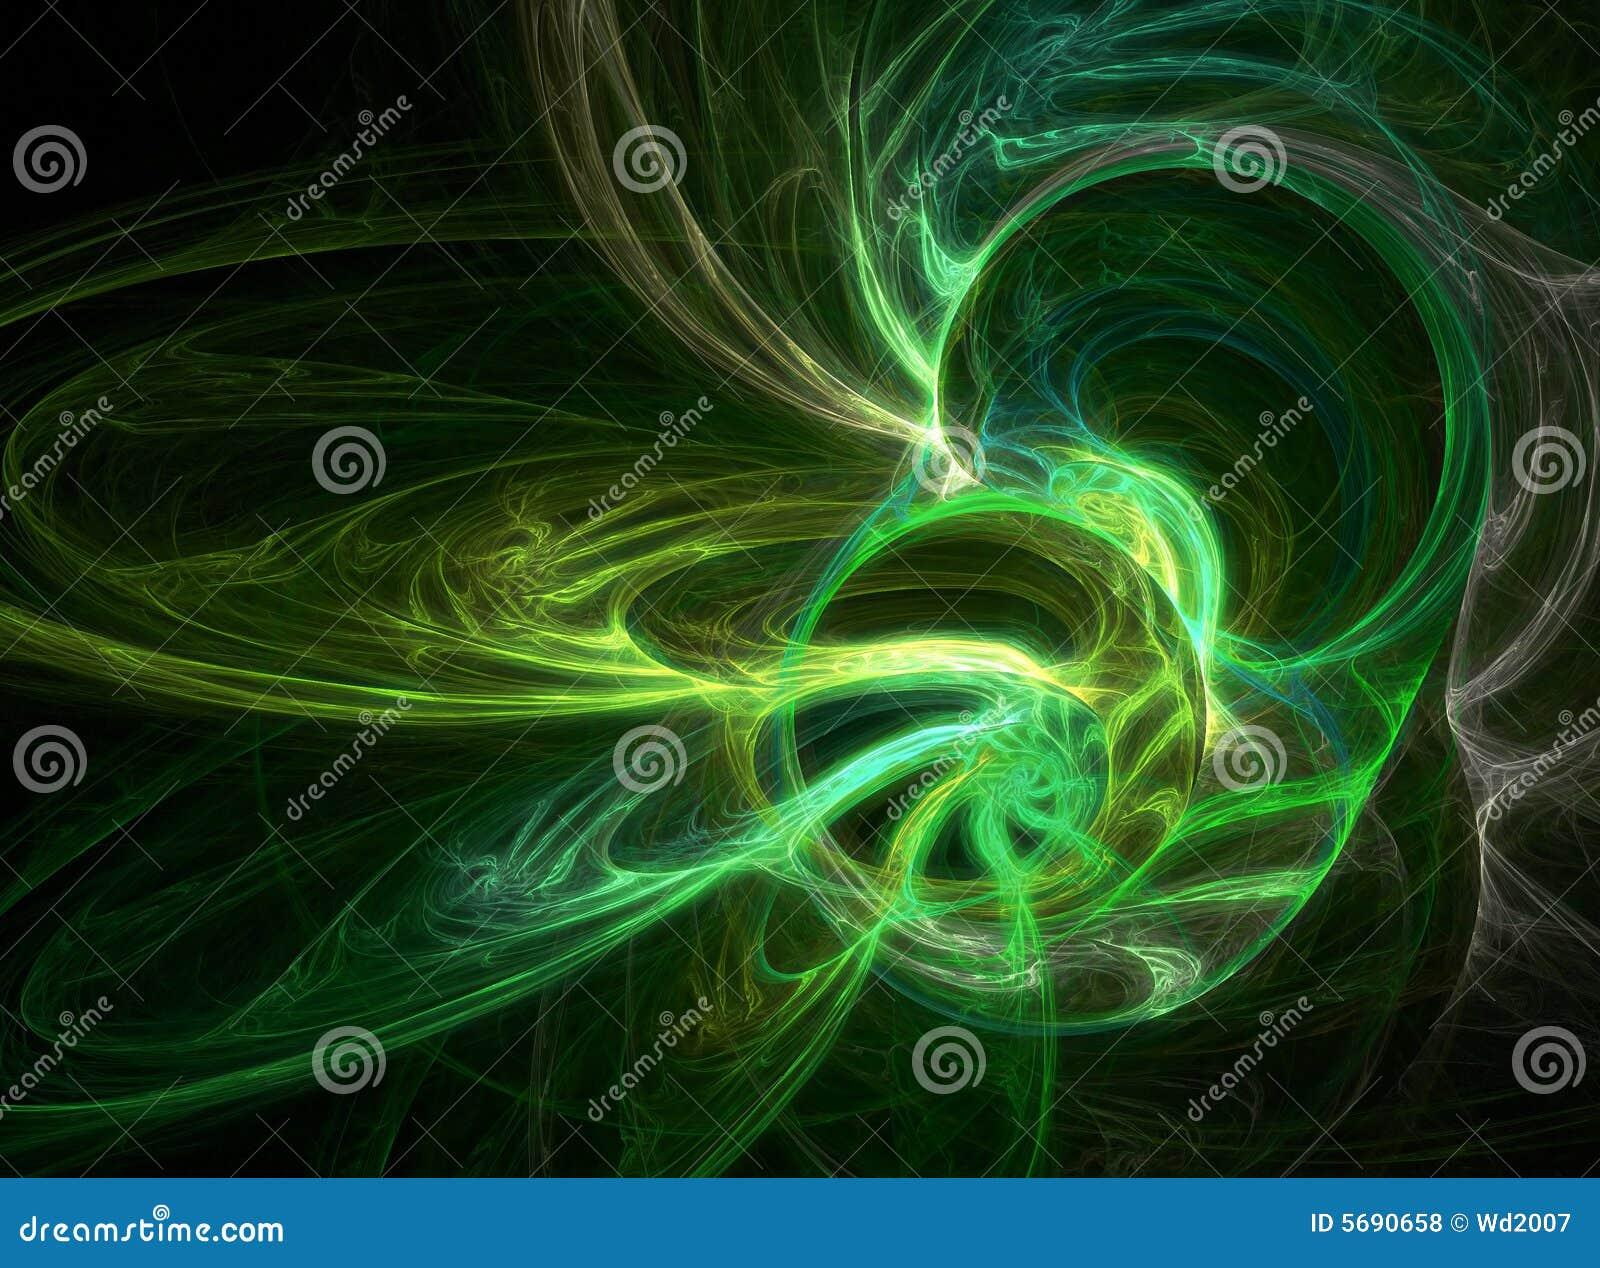 3d abstract green clown - photo #18